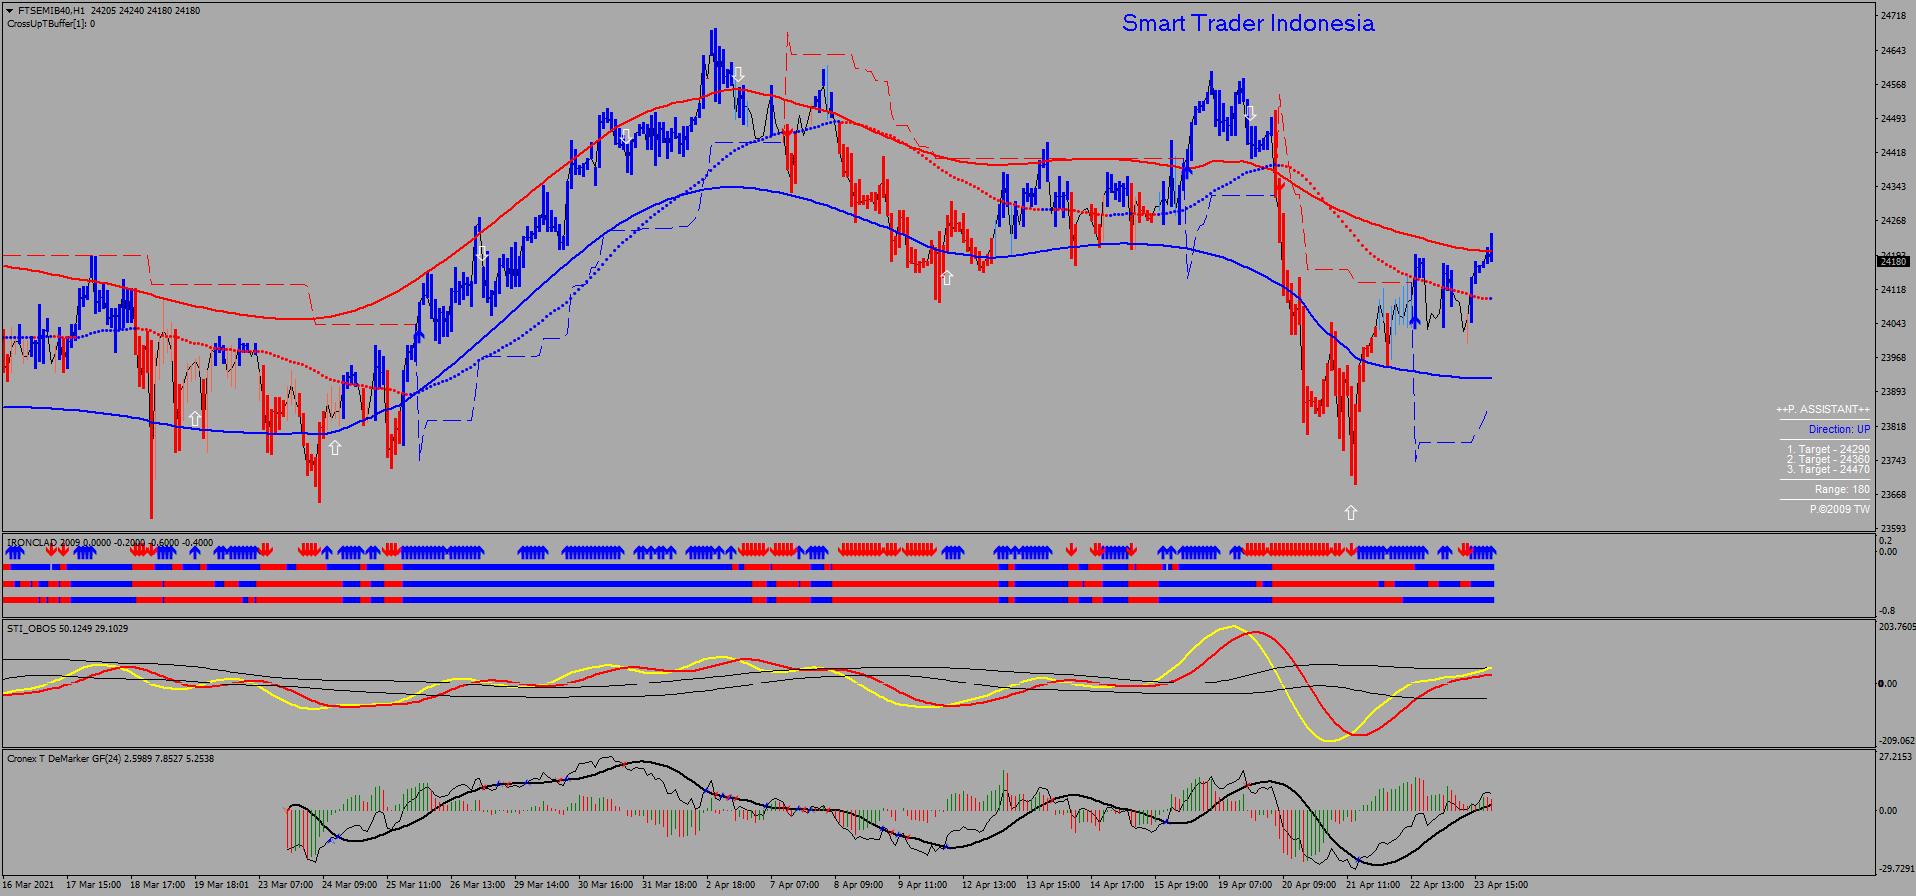 ftsemib40-h1-ava-trade-ltd.png